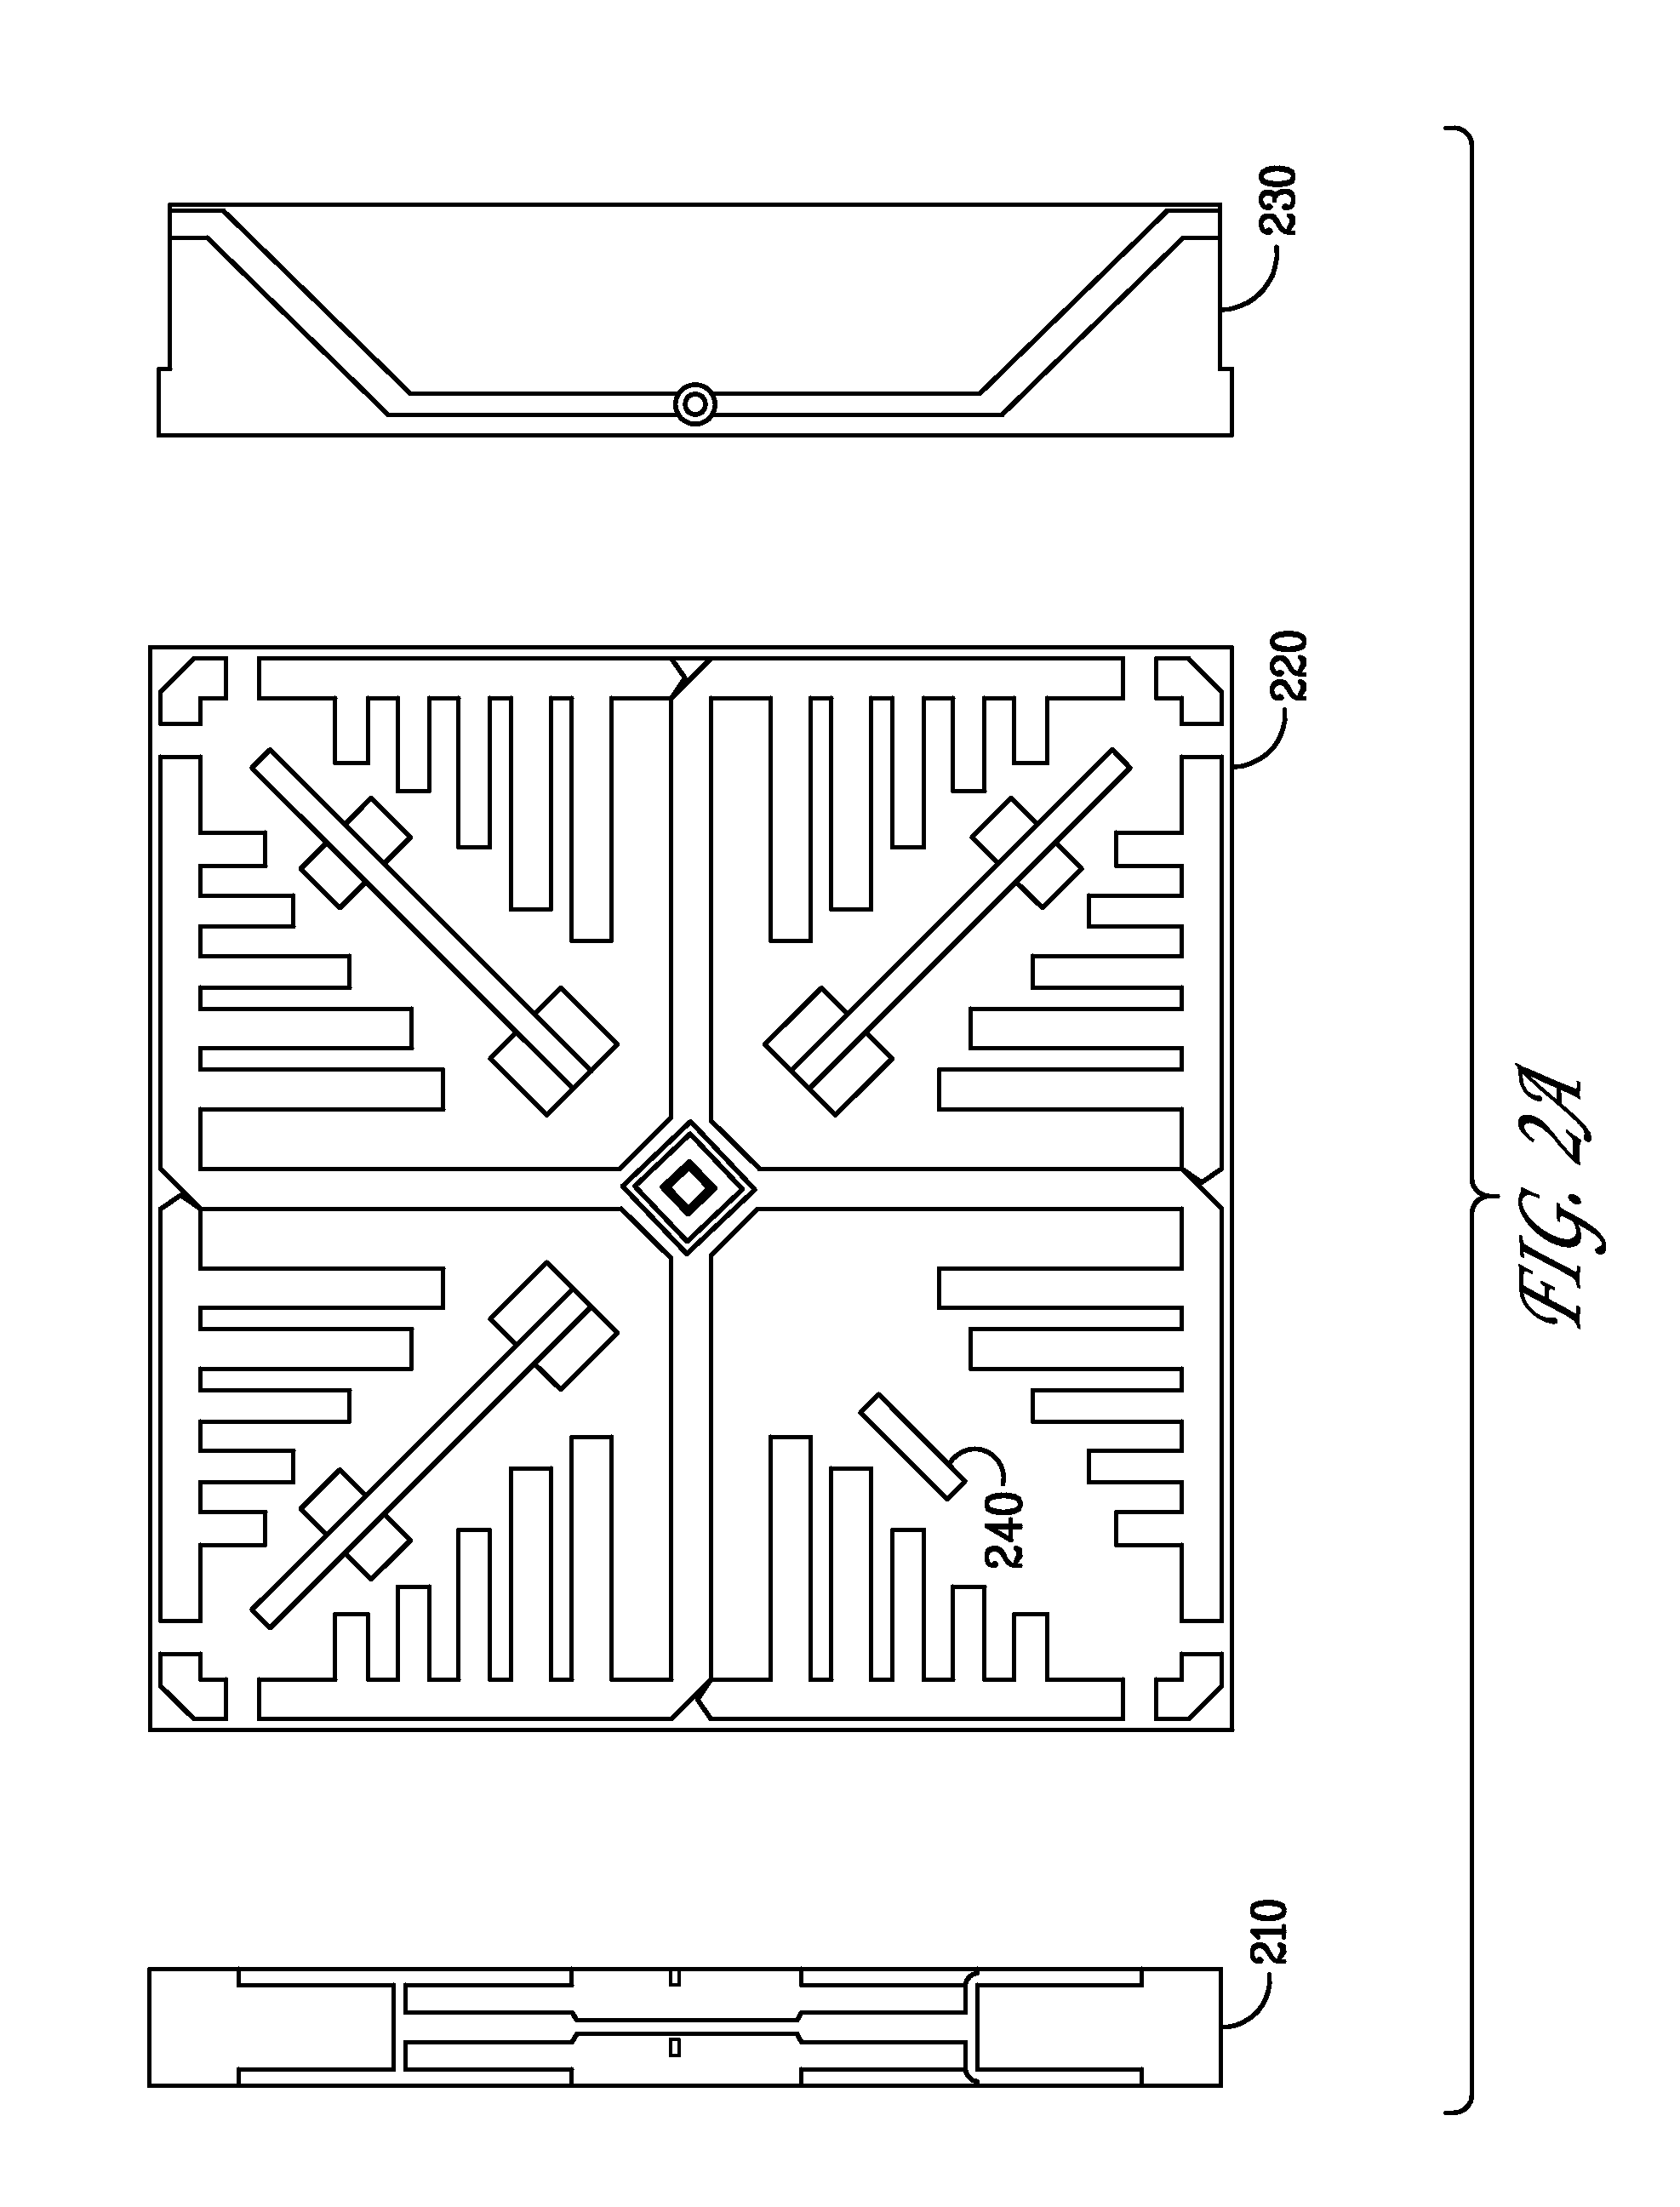 Patent US 10,181,655 B2